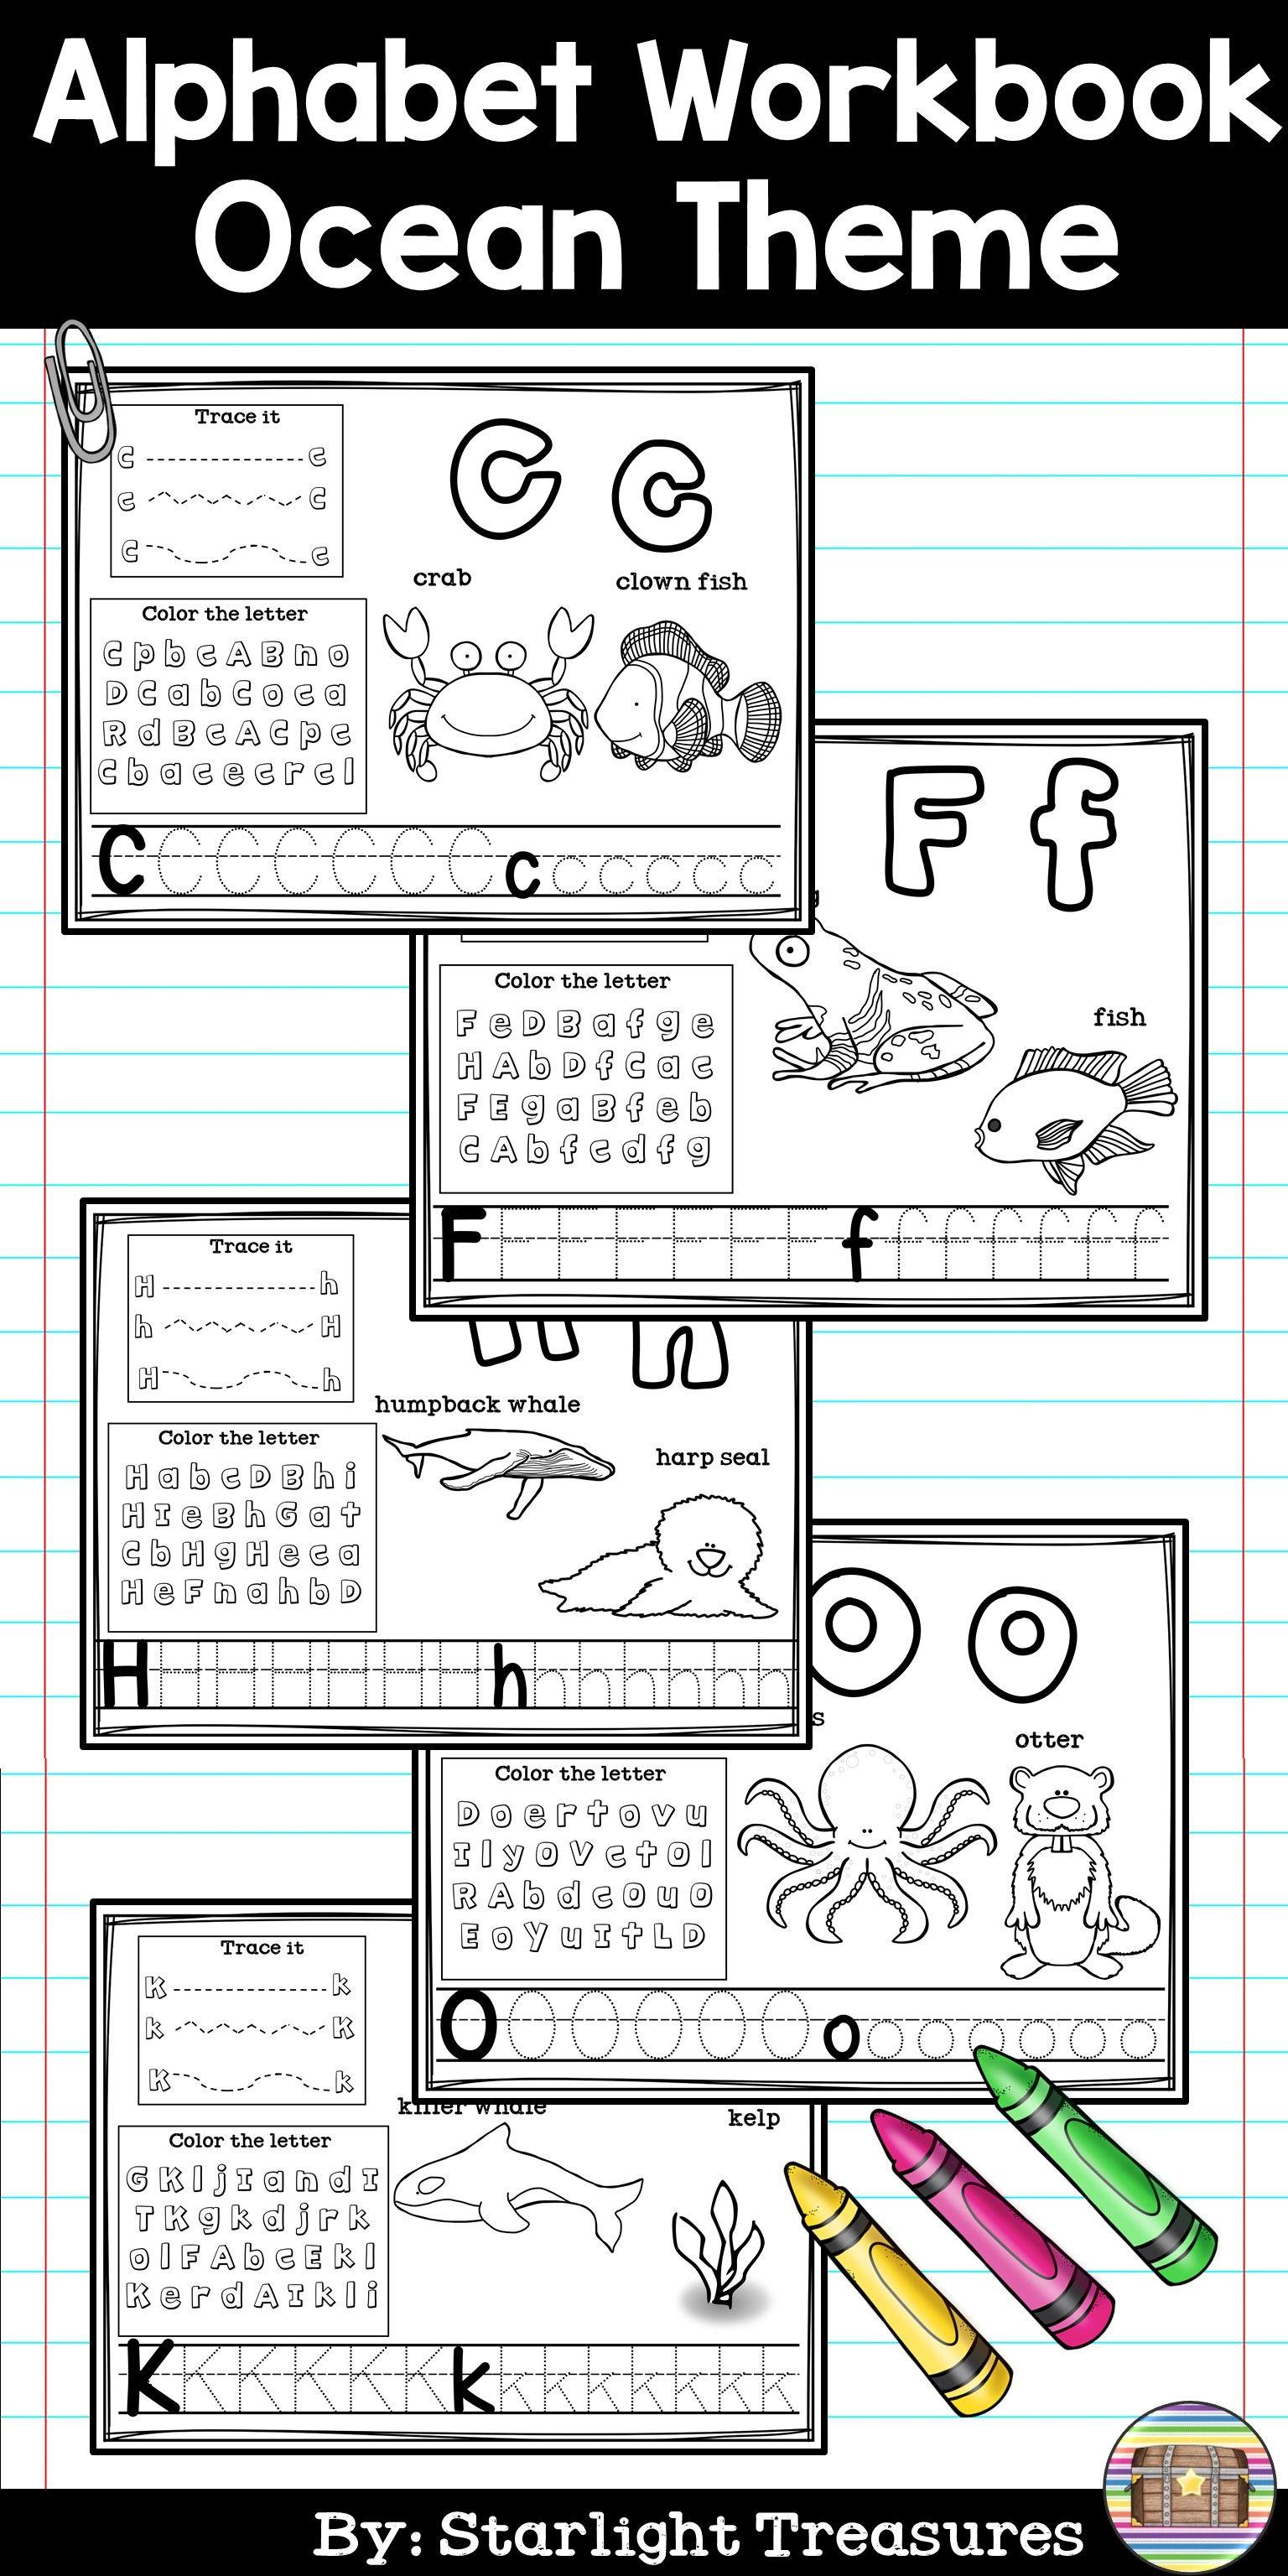 Alphabet Workbook Worksheets A Z The Ocean Theme